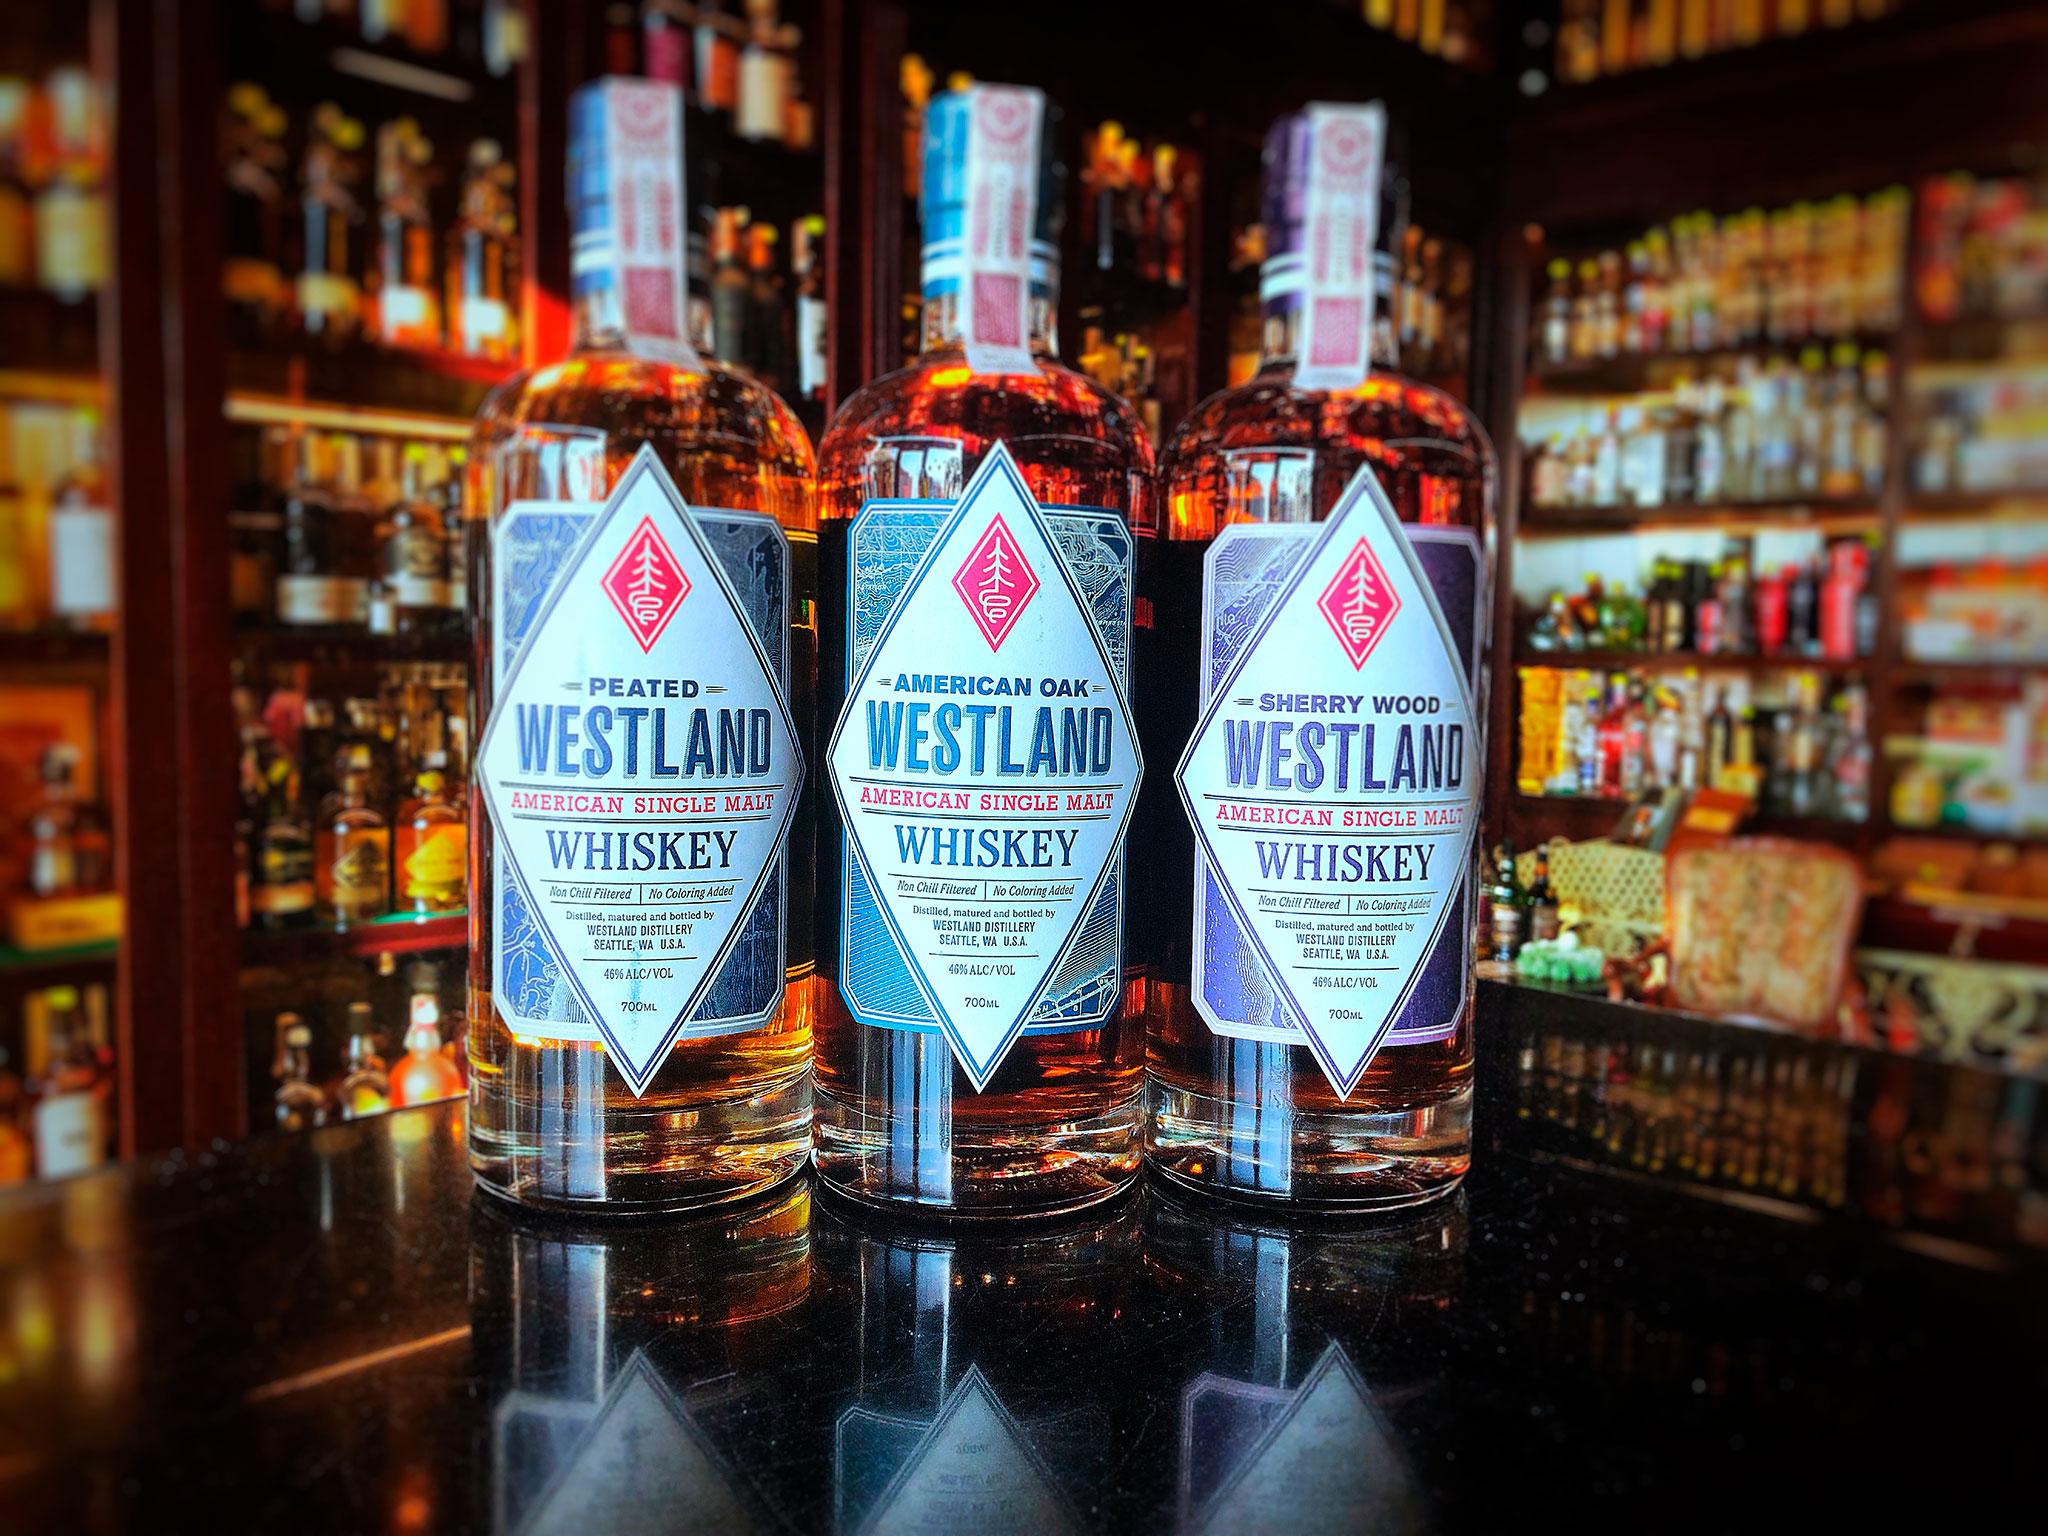 Westland single malt whiskey!